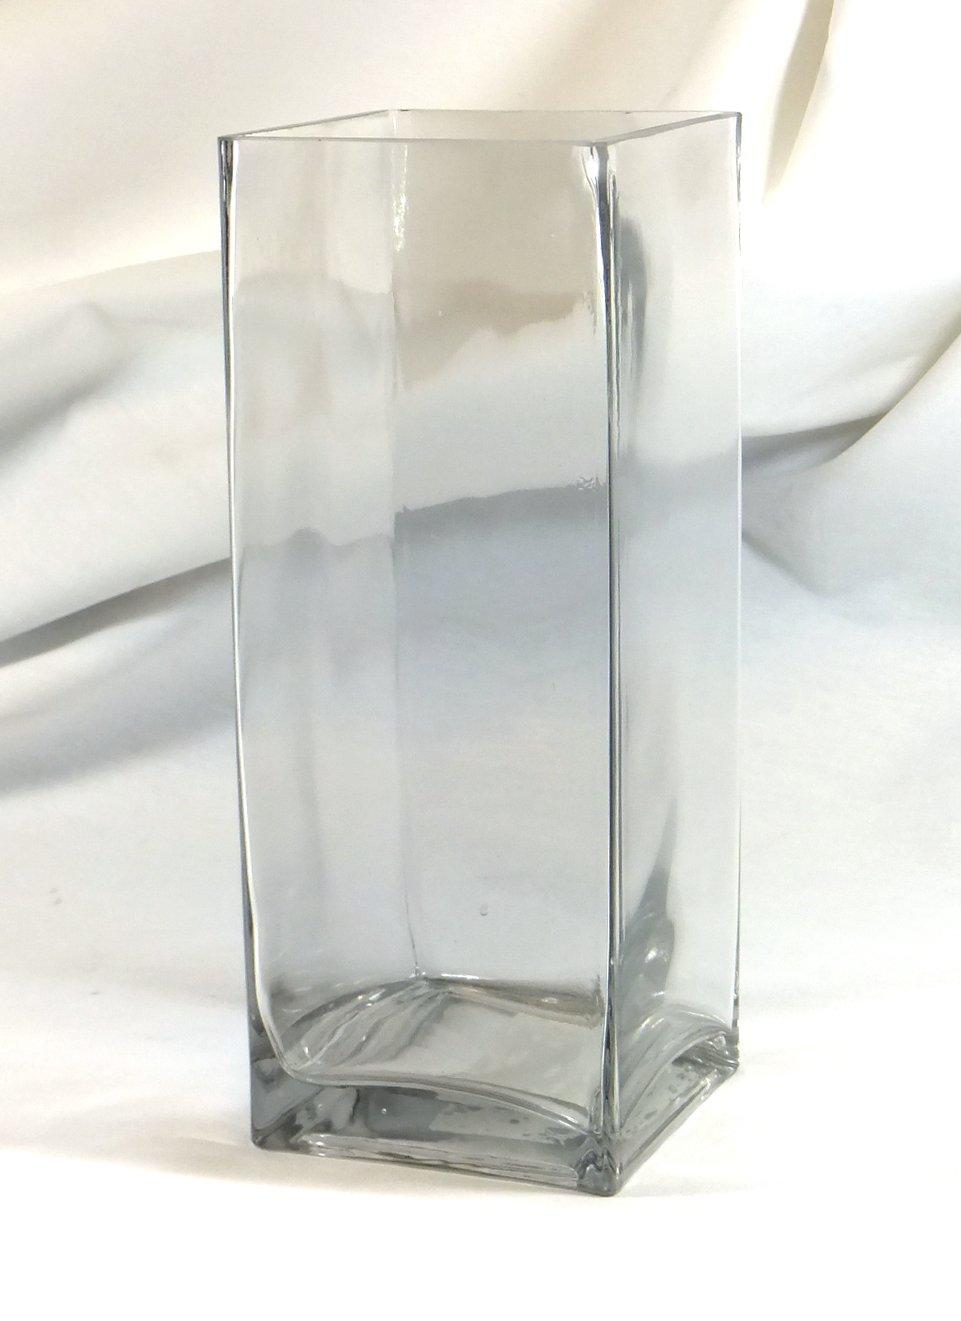 Amazon 10 rectangle glass block vase 10 inch high clear amazon 10 rectangle glass block vase 10 inch high clear square pillar centerpiece 10x4x4 candleholder home kitchen reviewsmspy